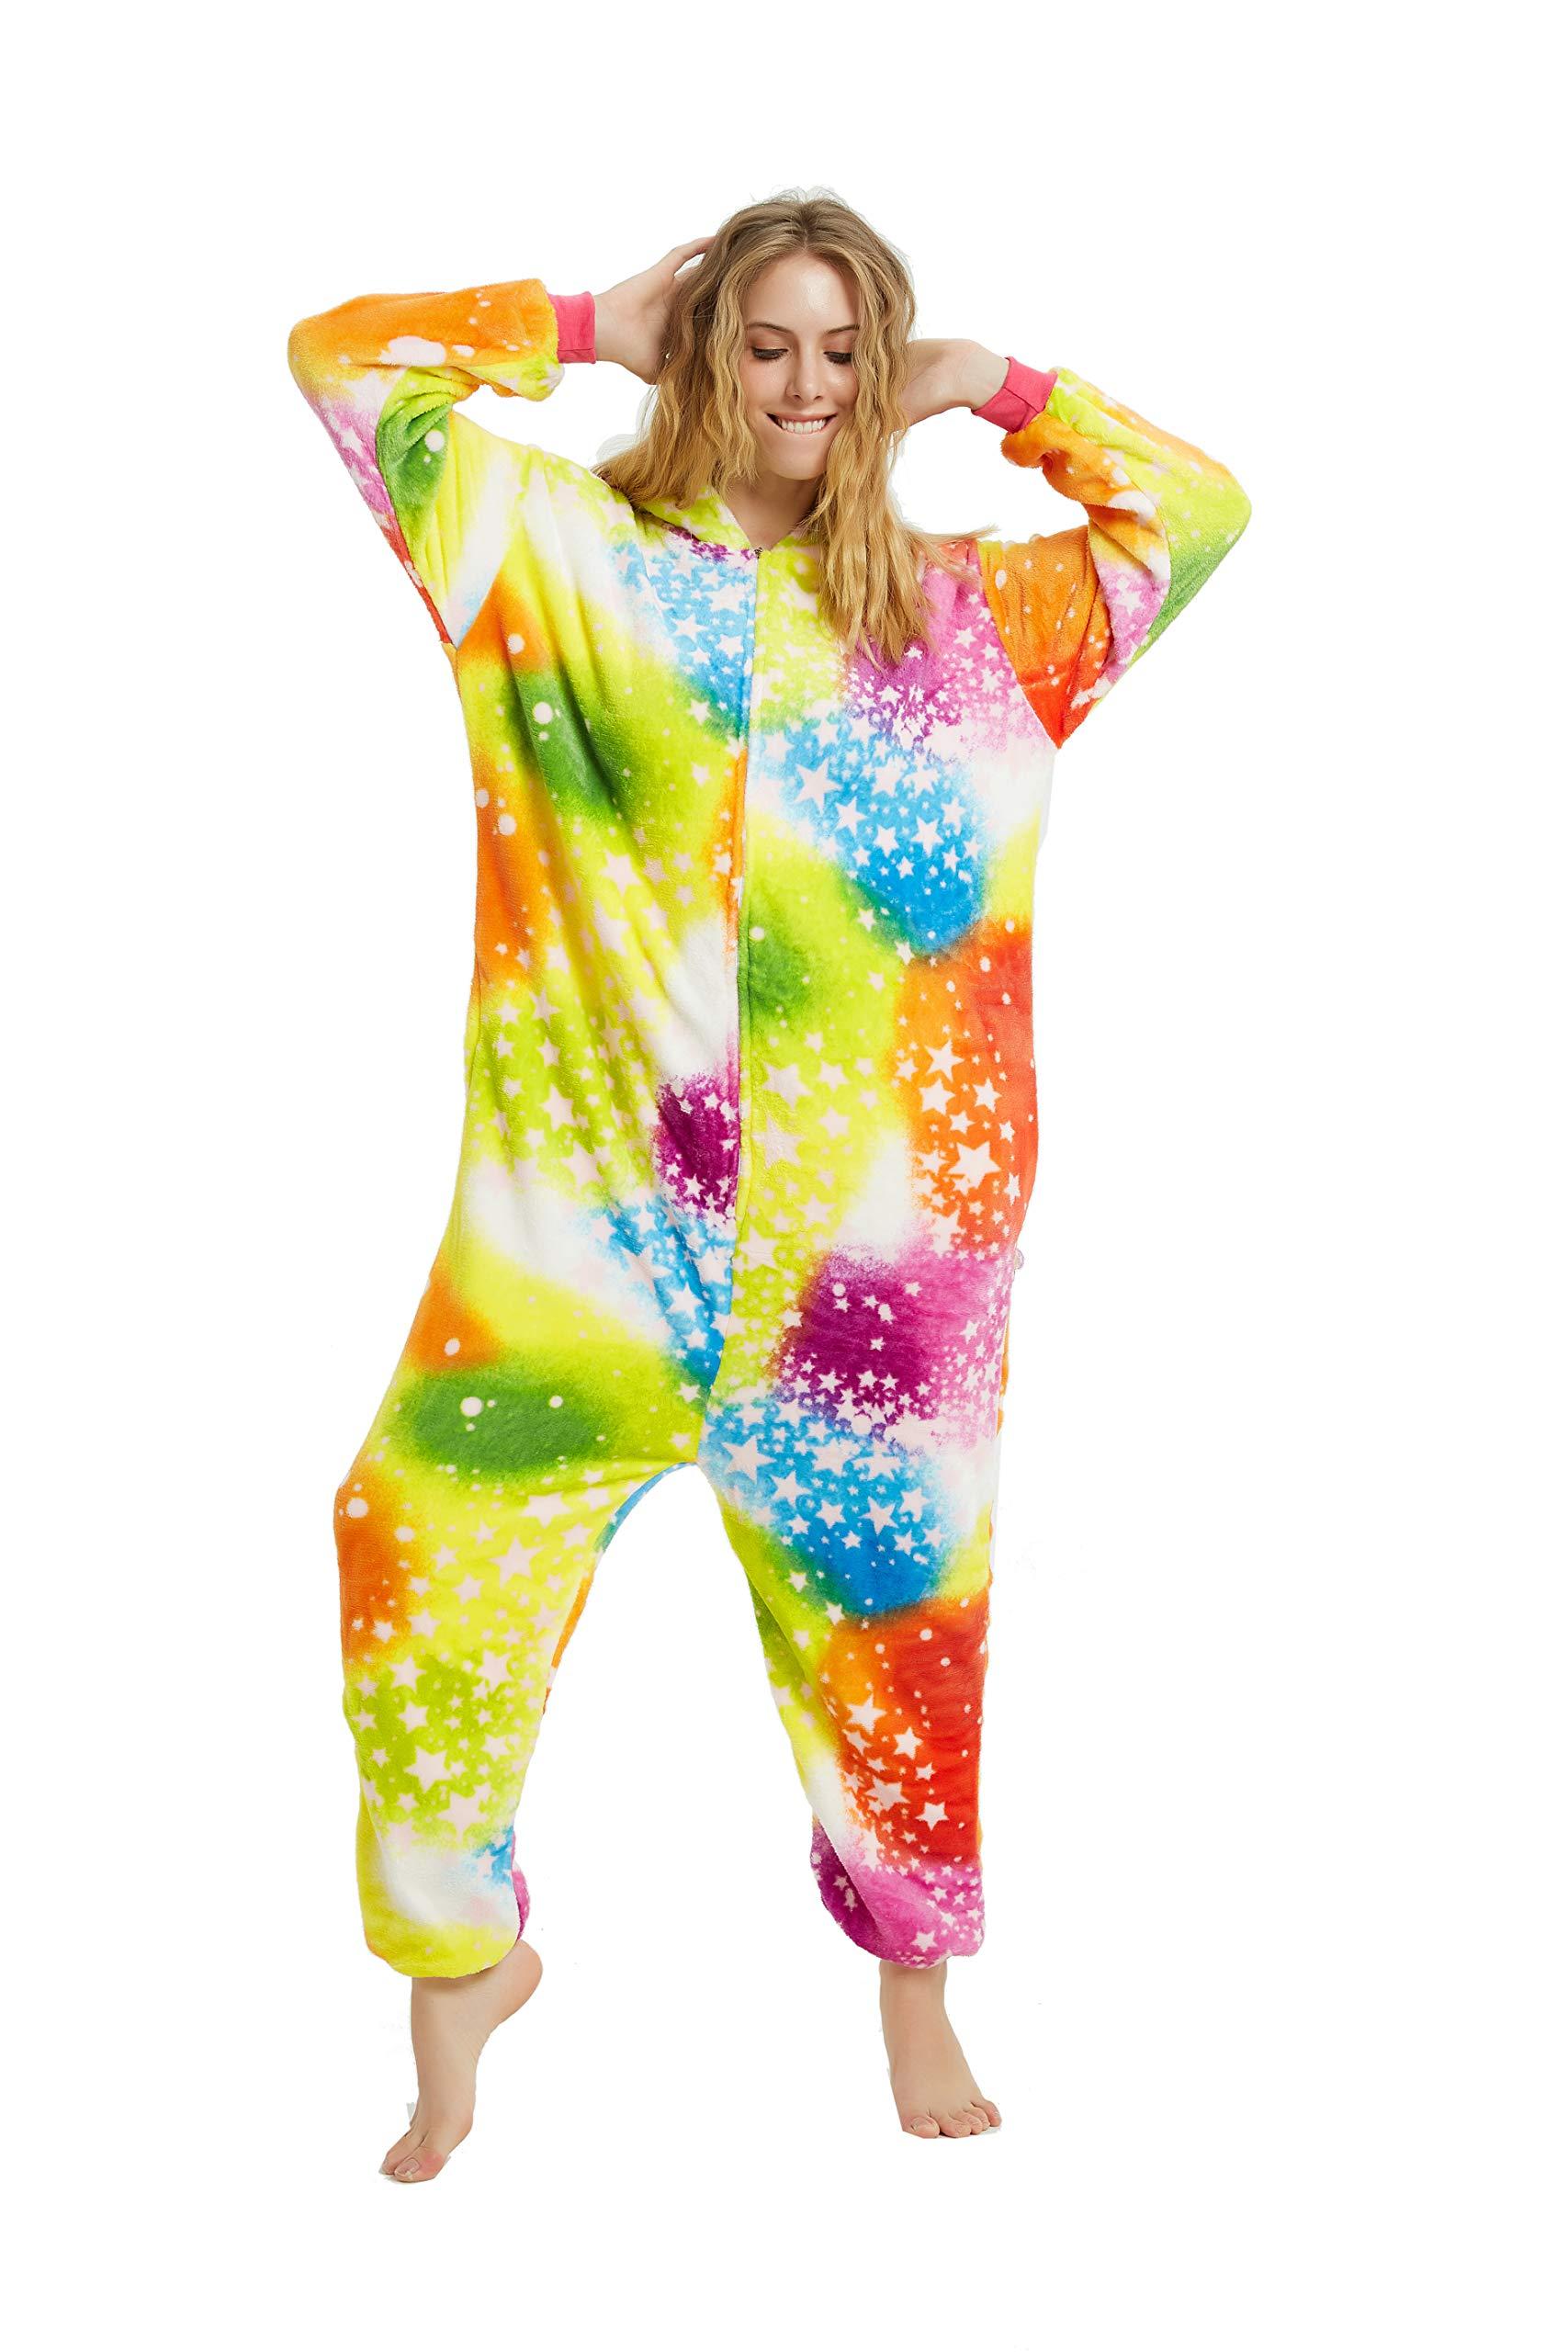 Adult Onesies for Women Men Girls Unicorn Costume Halloween Christmas Animal Pajamas